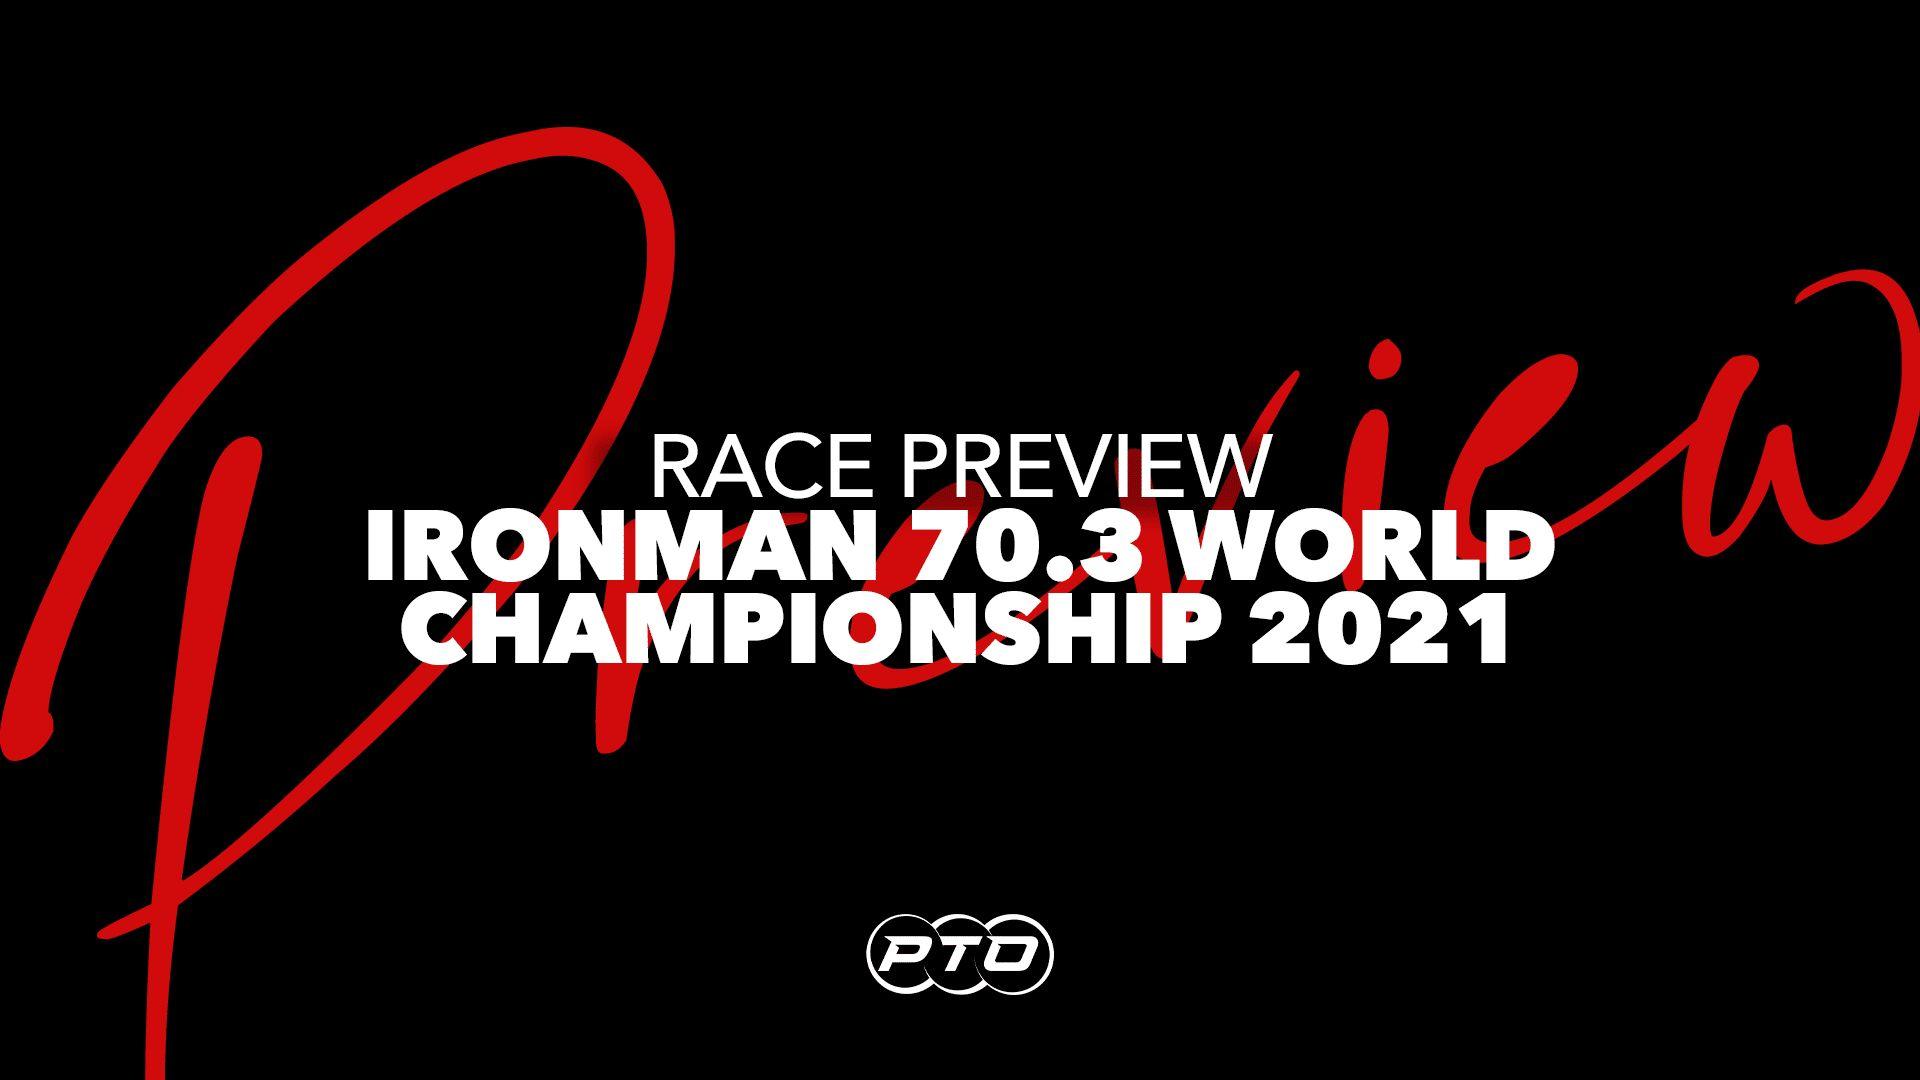 Ironman 70.3 World Championship 2021 Preview